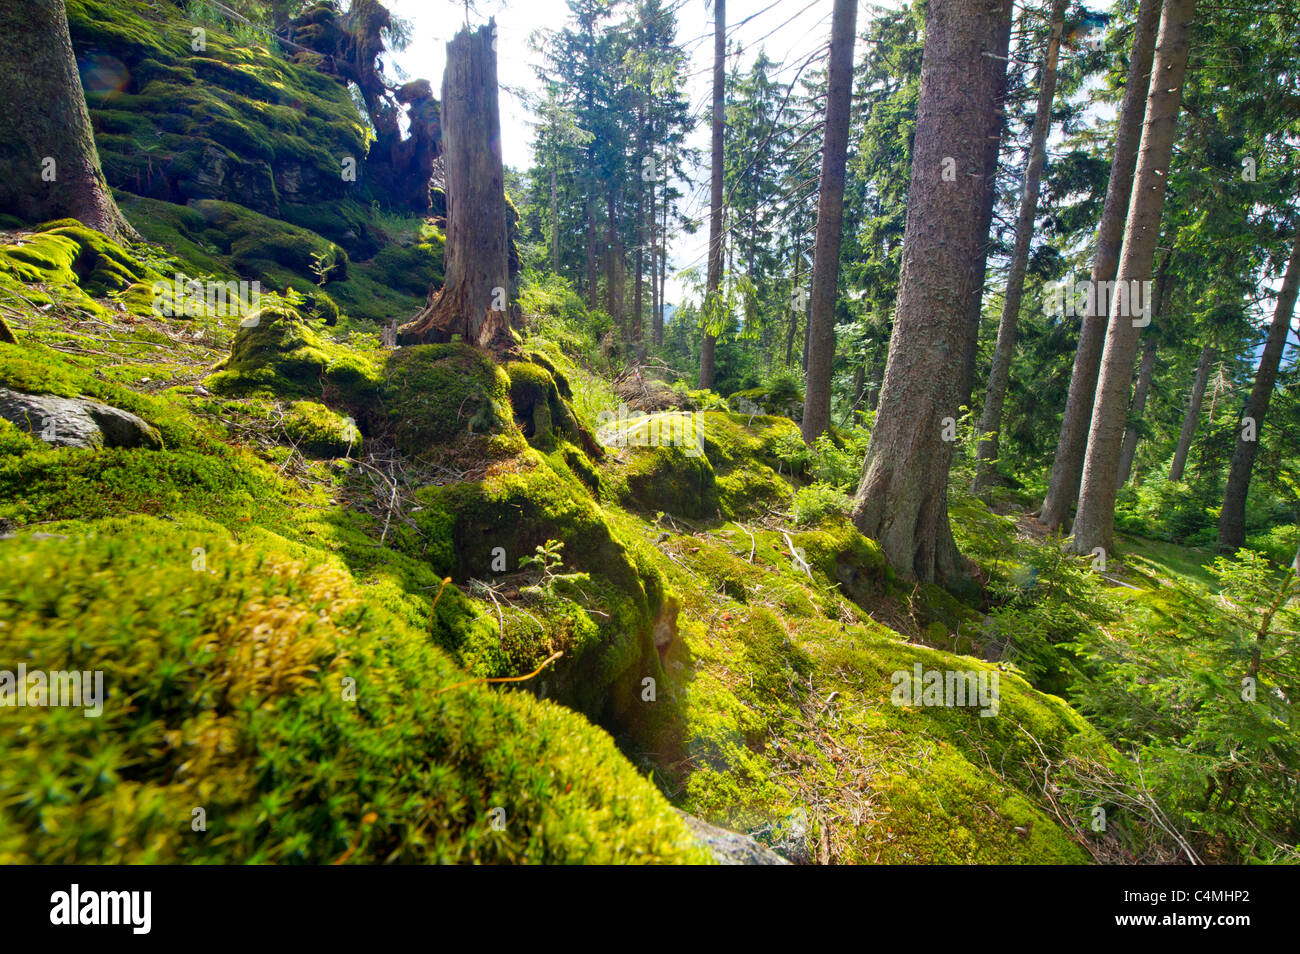 Nationalpark NP Bayerischer Wald Bavarian Forest Mt. Falkenstein Mountain Spruce Forest vacation Mountains rock - Stock Image